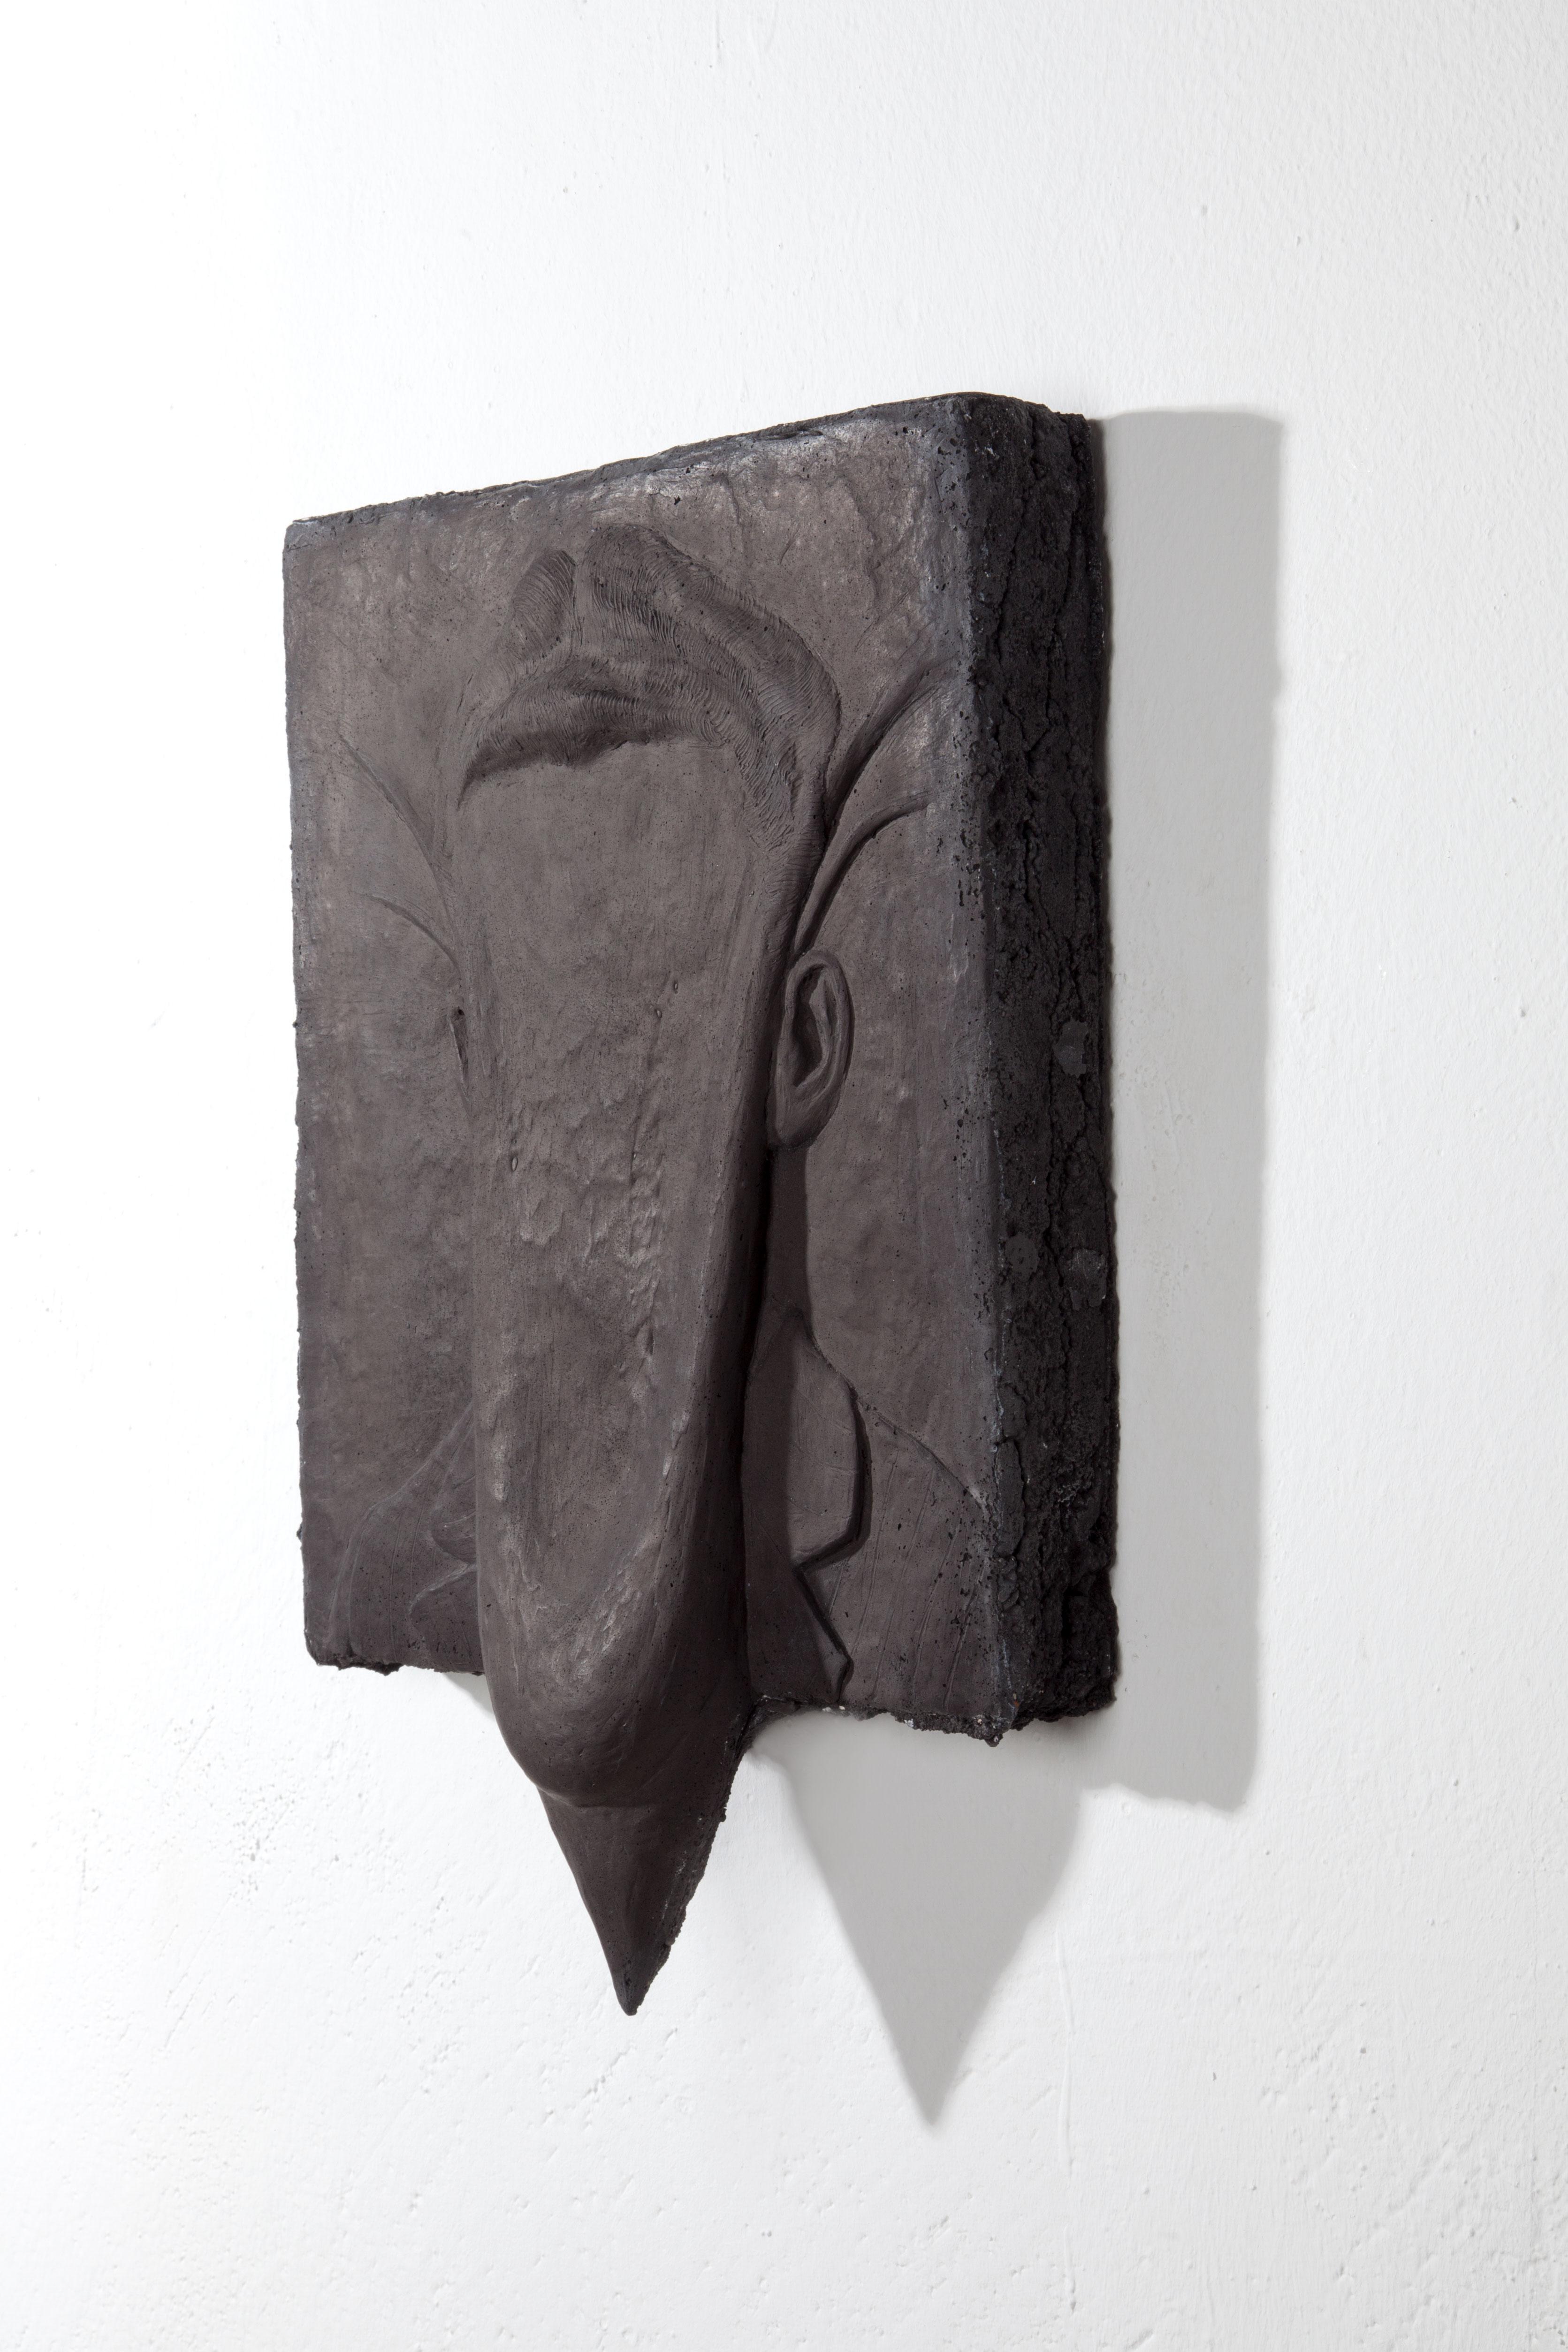 Untitled-1-(4)